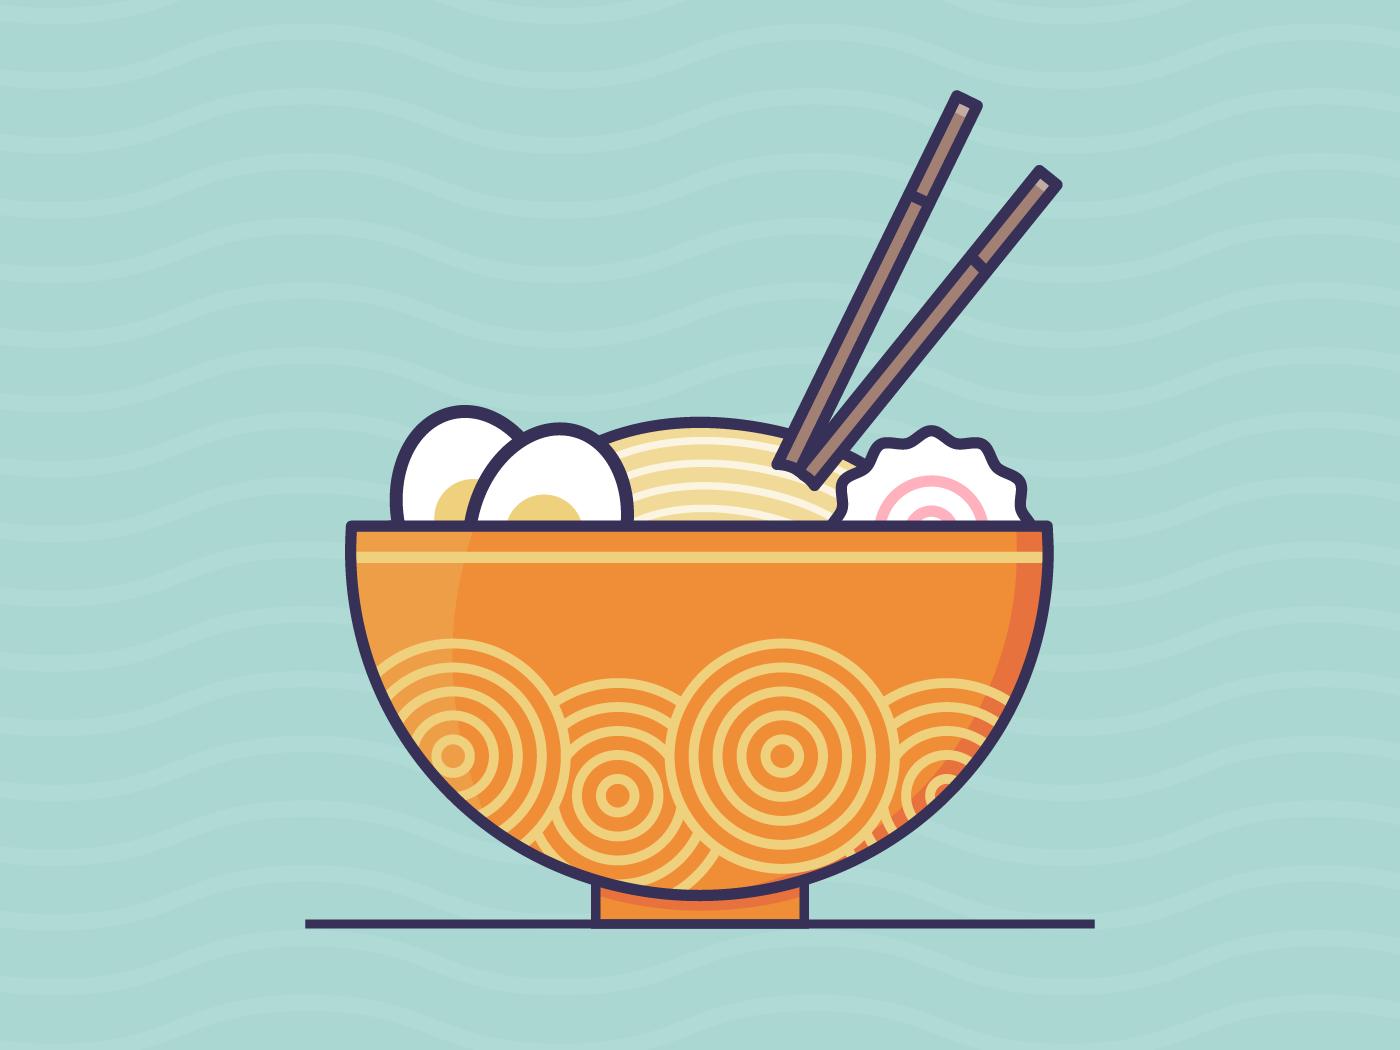 Ramen ramen food vector simple illustrator illustration